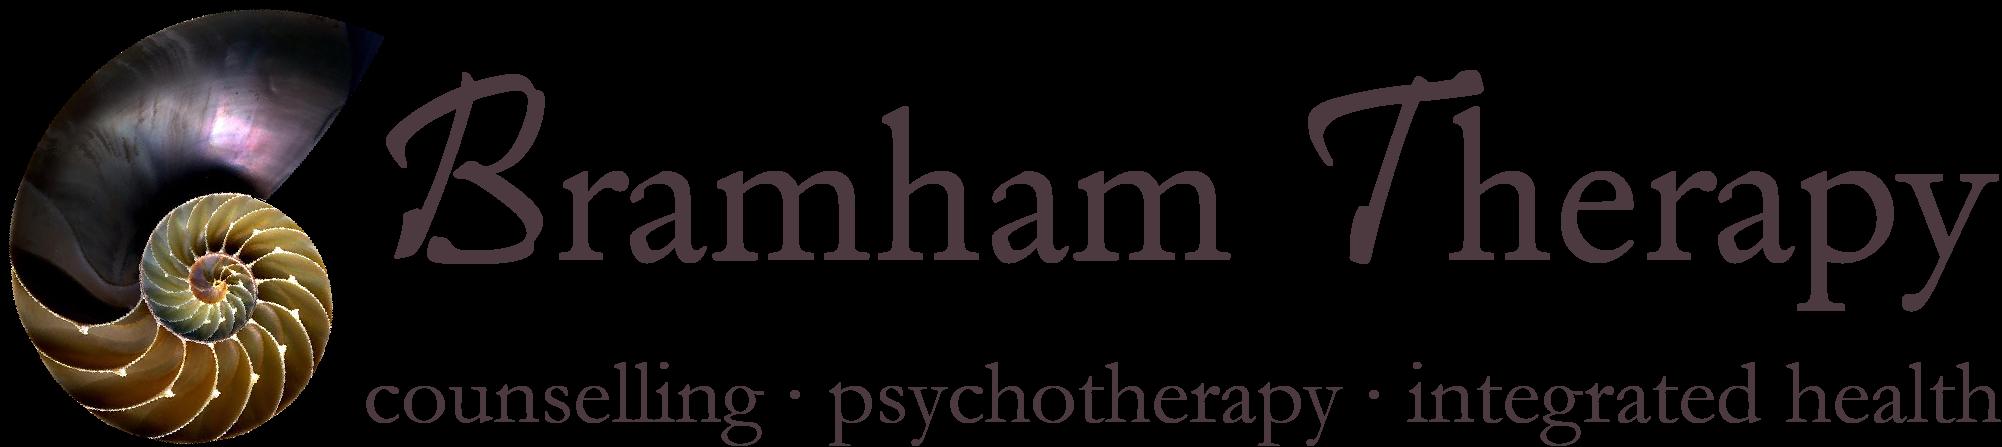 Bramham Therapy